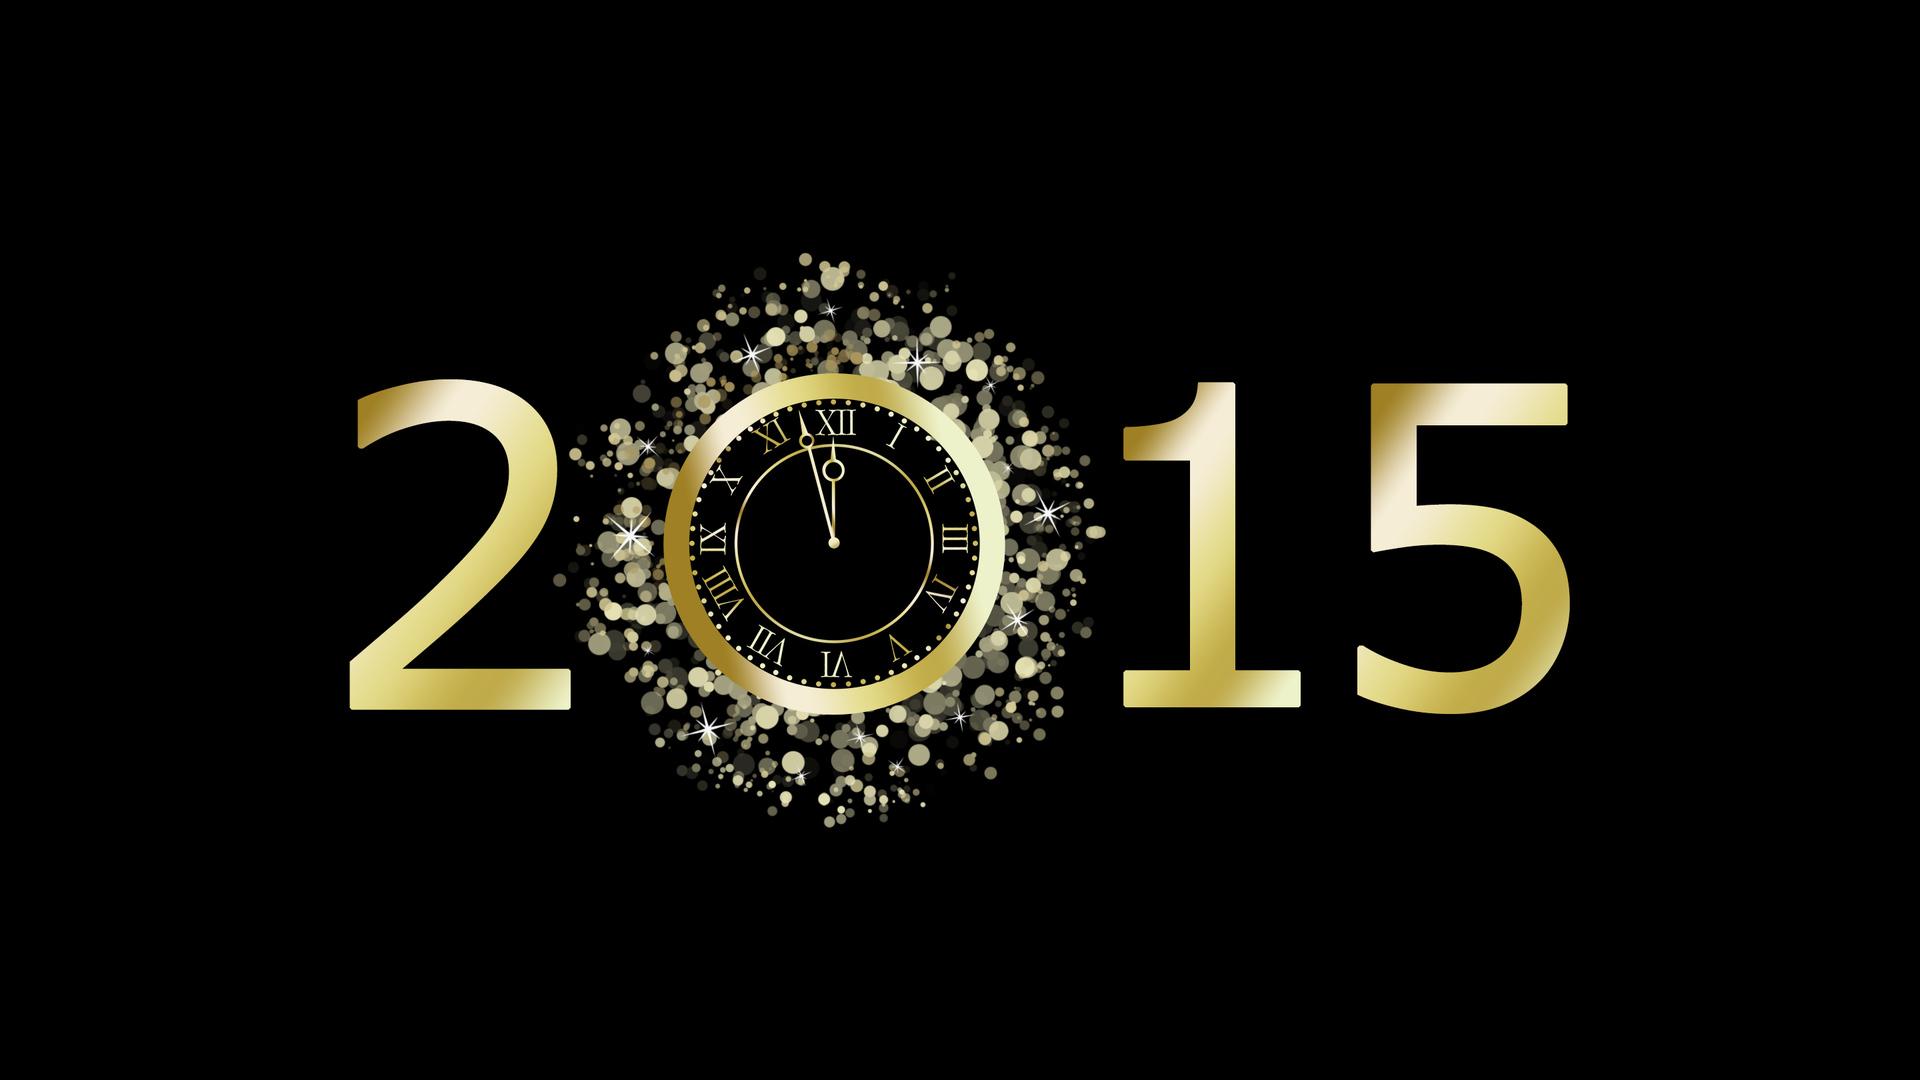 Happy New Year 2015 Hd Desktop Wallpapers HD Wallpapers 1920x1080